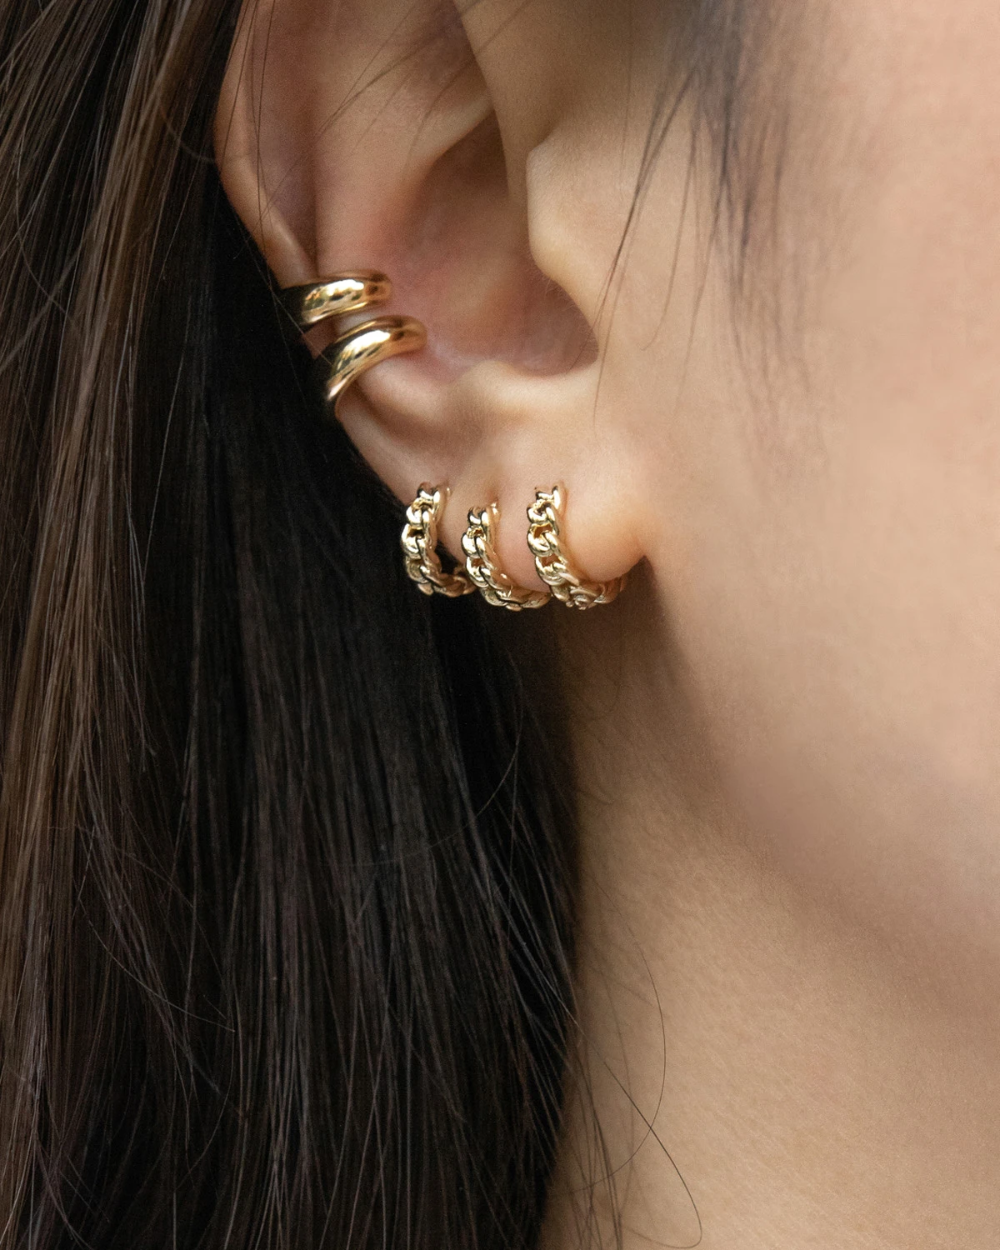 White Zircon Bar and Sea Shell Chain Double Ear Studs Earring